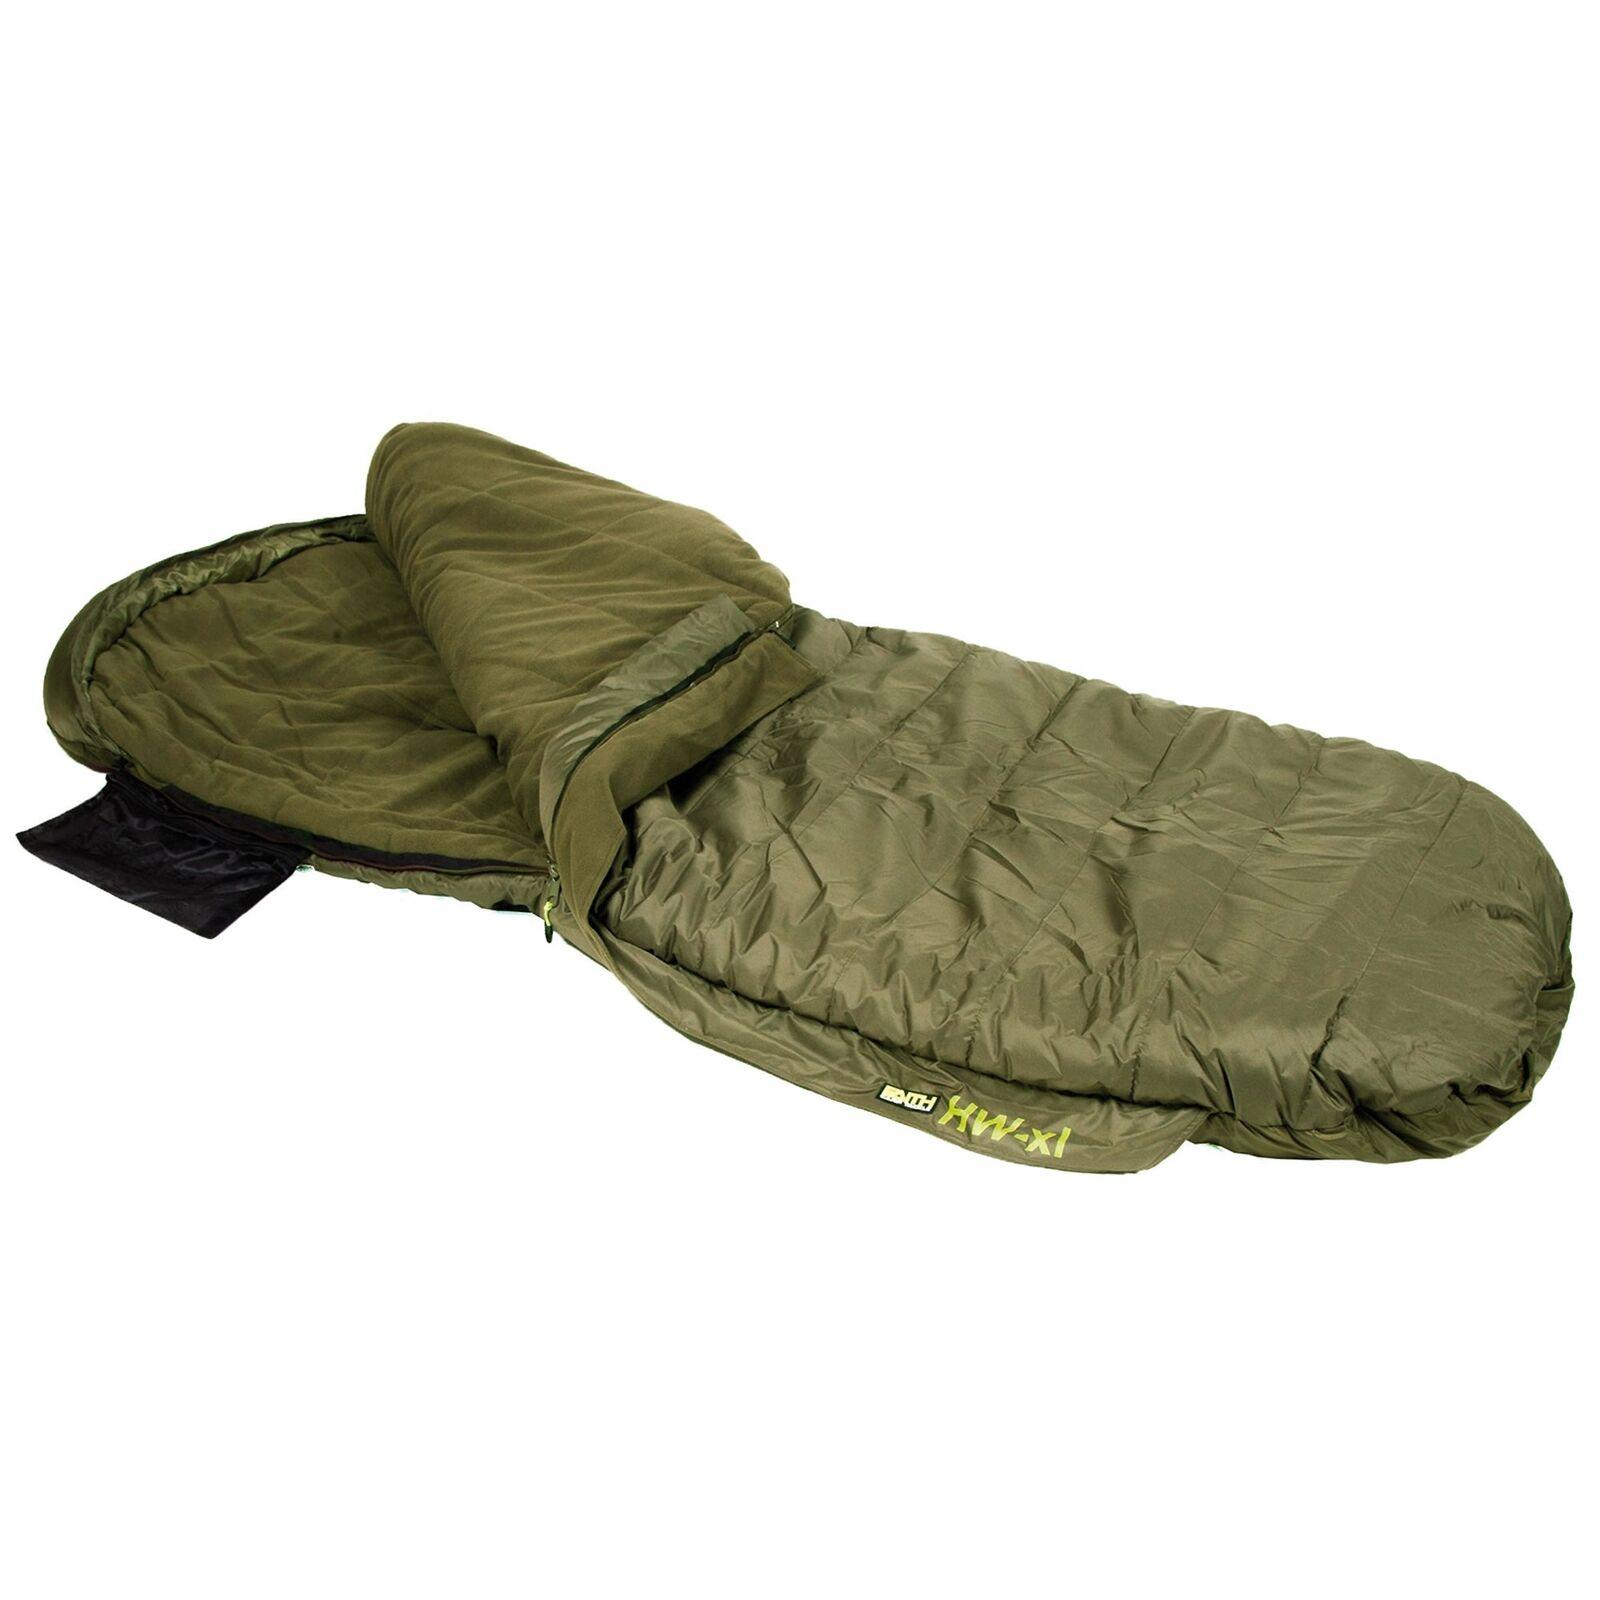 Faith HW XL Sacco a pelo 2in1 5season Angel Sleeping borsa 213x93x10cm